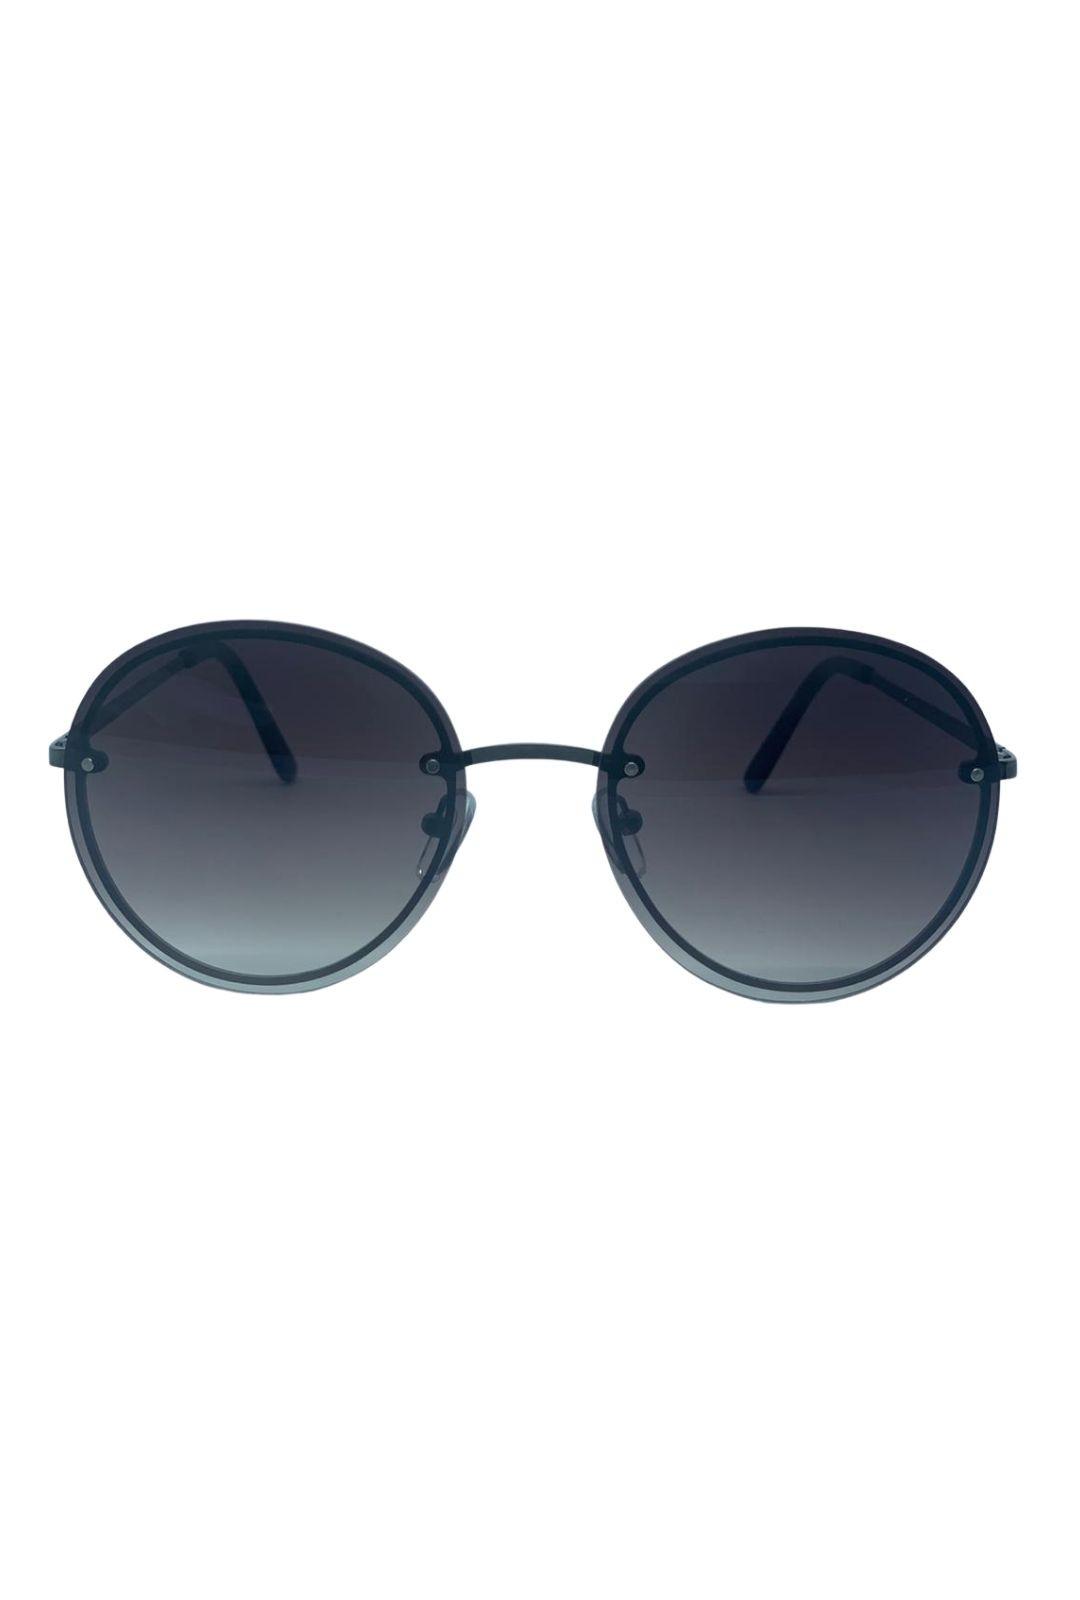 Óculos Alphaville Preto